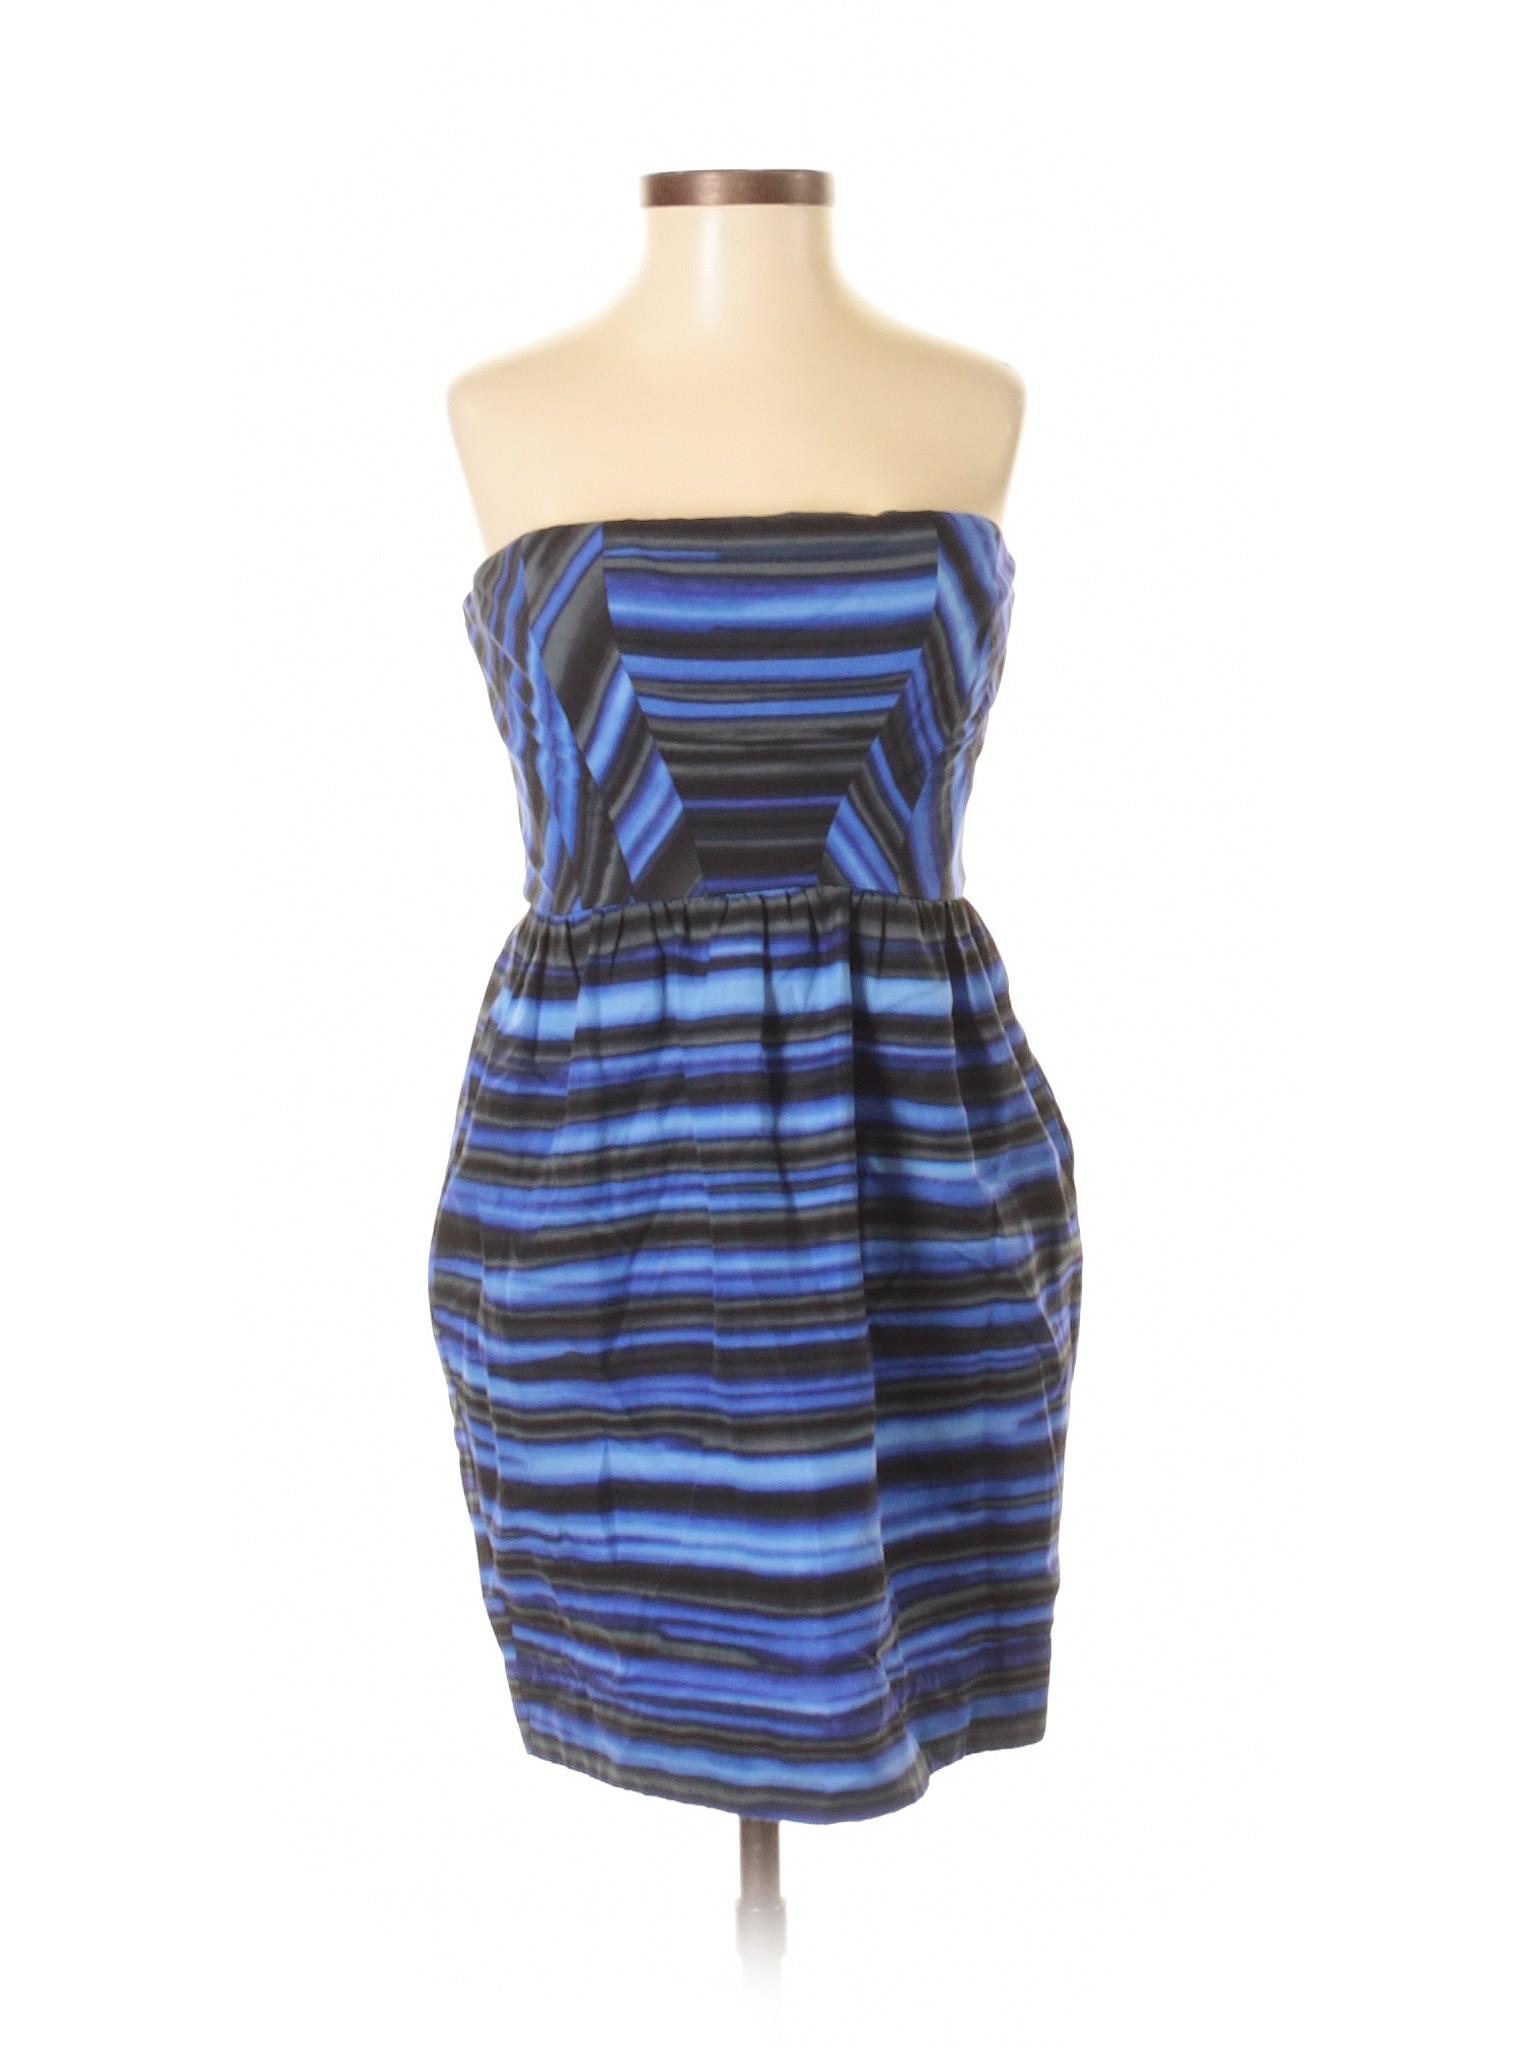 Shoshanna Casual winter Casual Dress Shoshanna Boutique Boutique winter 5raqwpf5